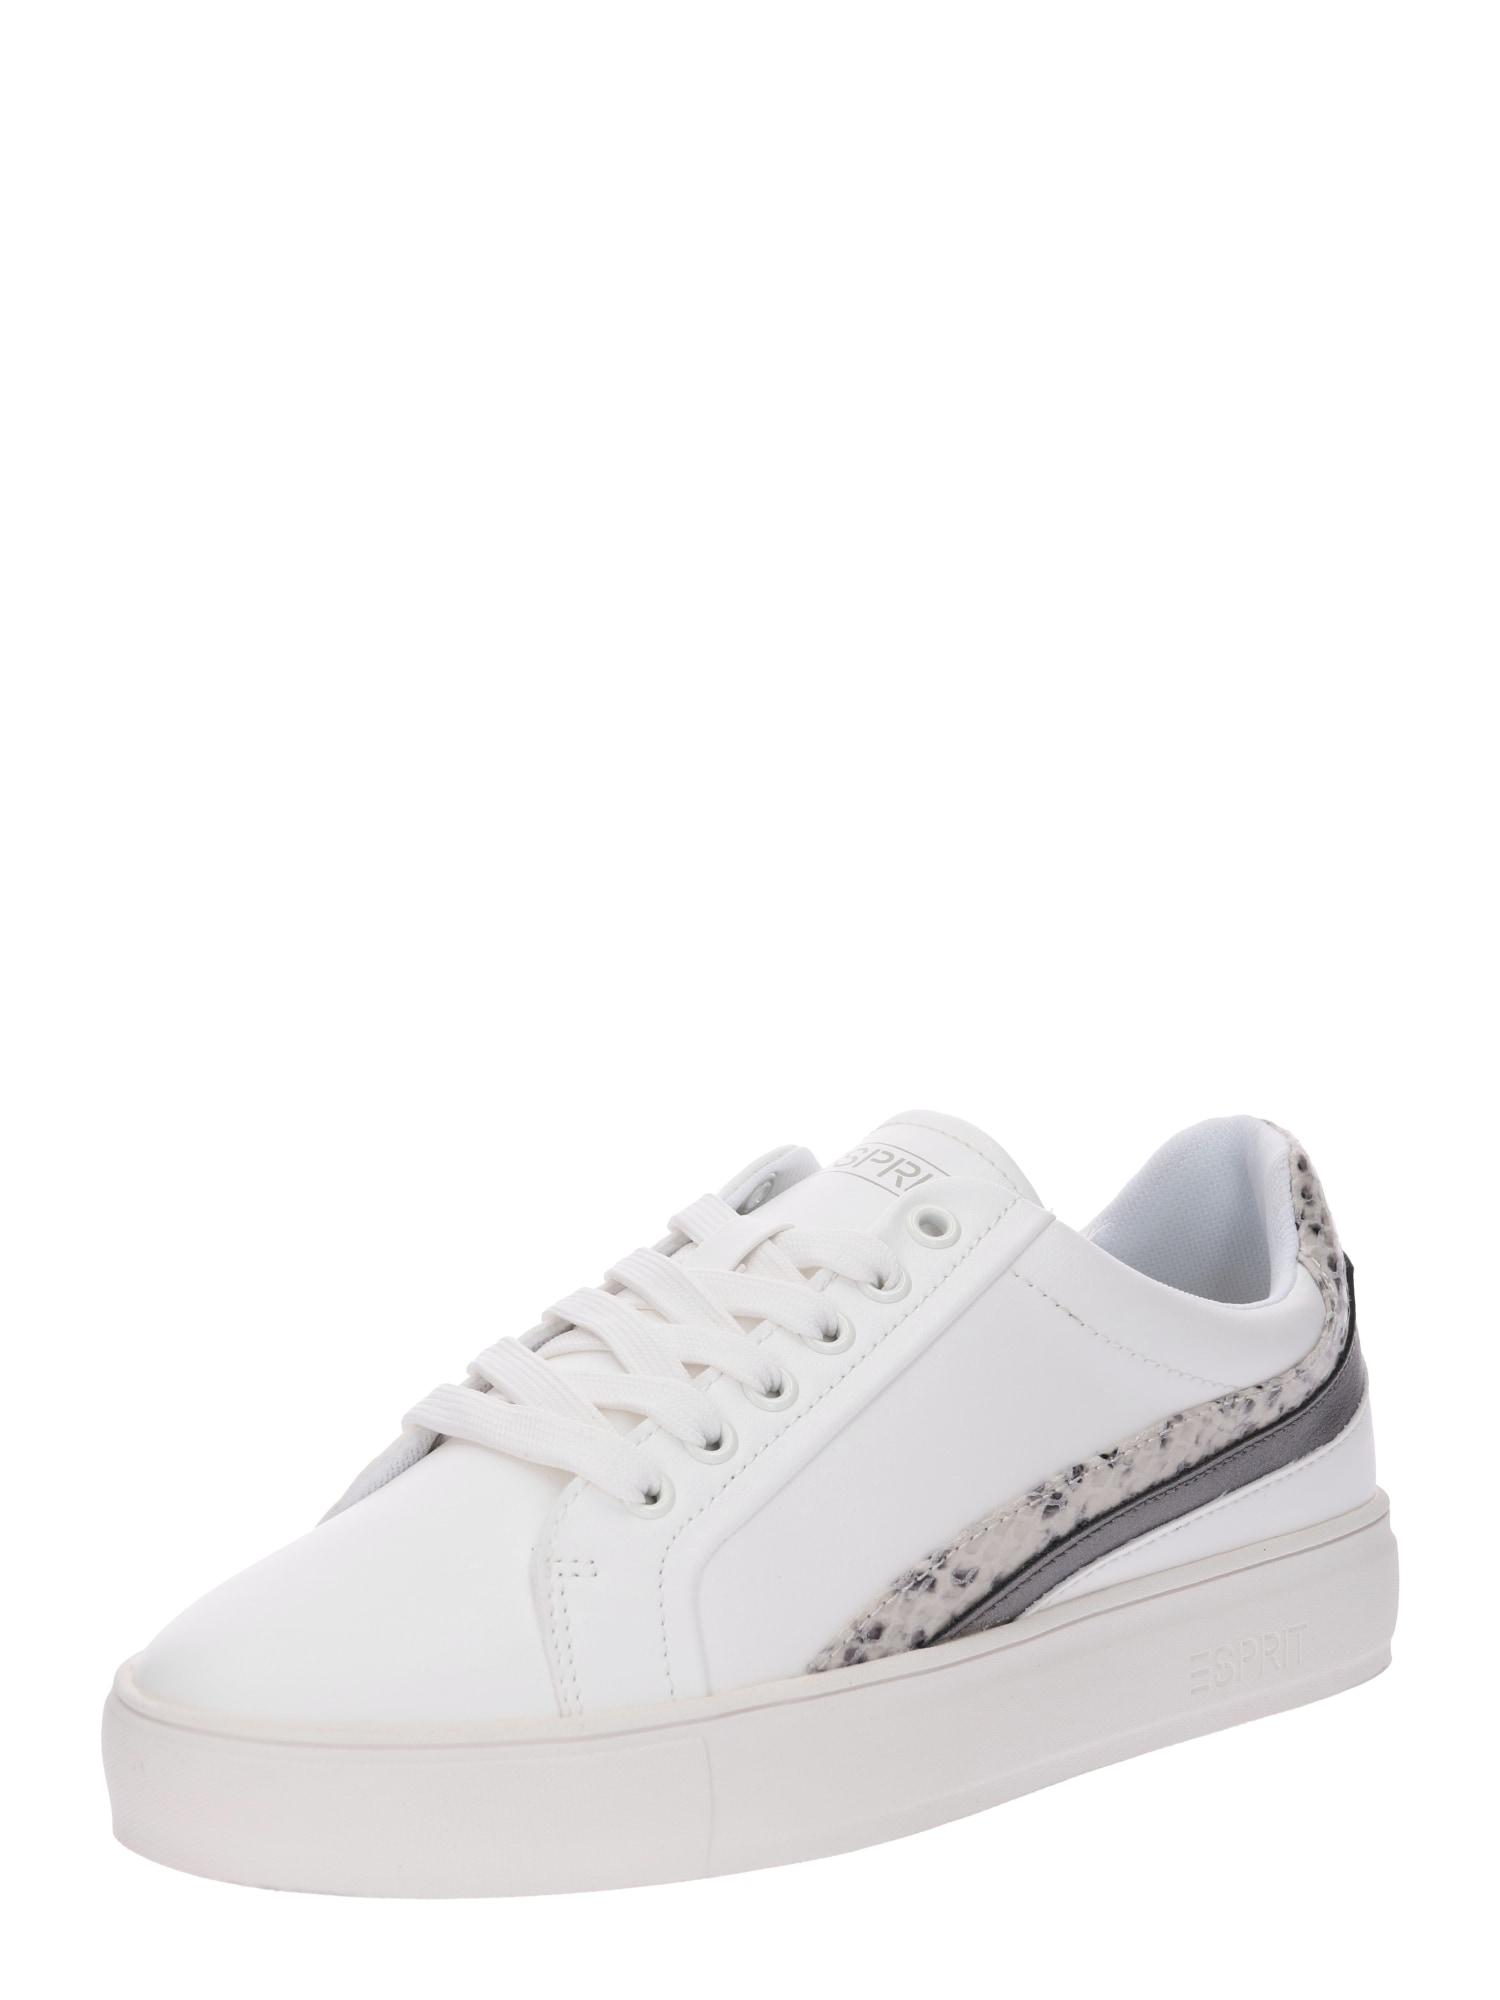 Tenisky Colette LU Casual Shoes  bílá ESPRIT